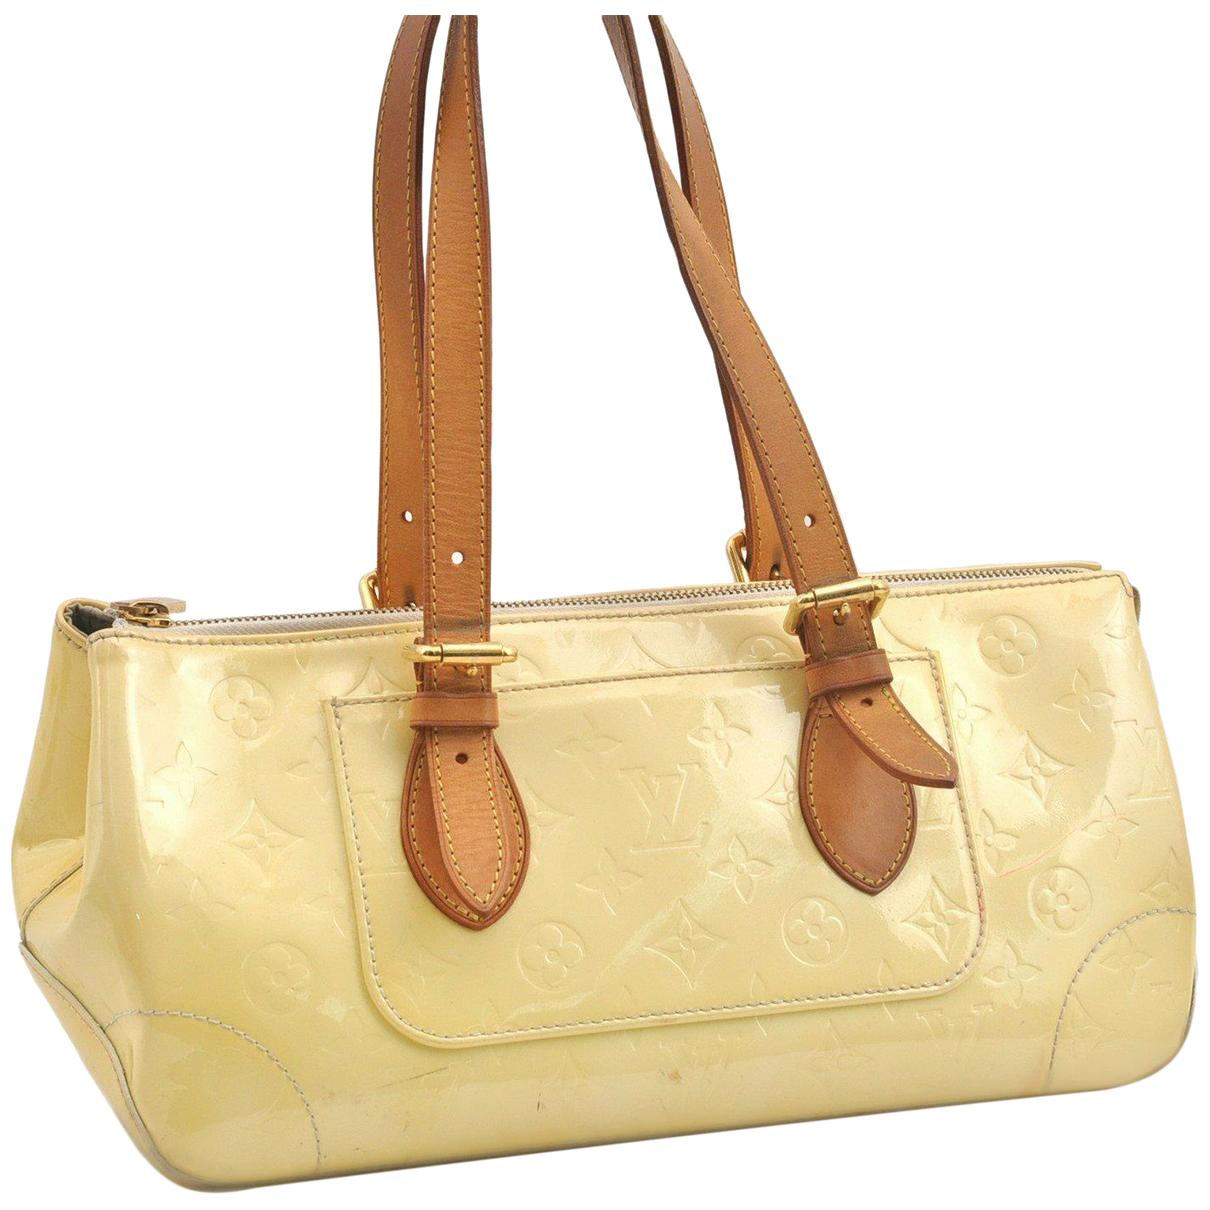 Louis Vuitton N Yellow Patent leather handbag for Women N